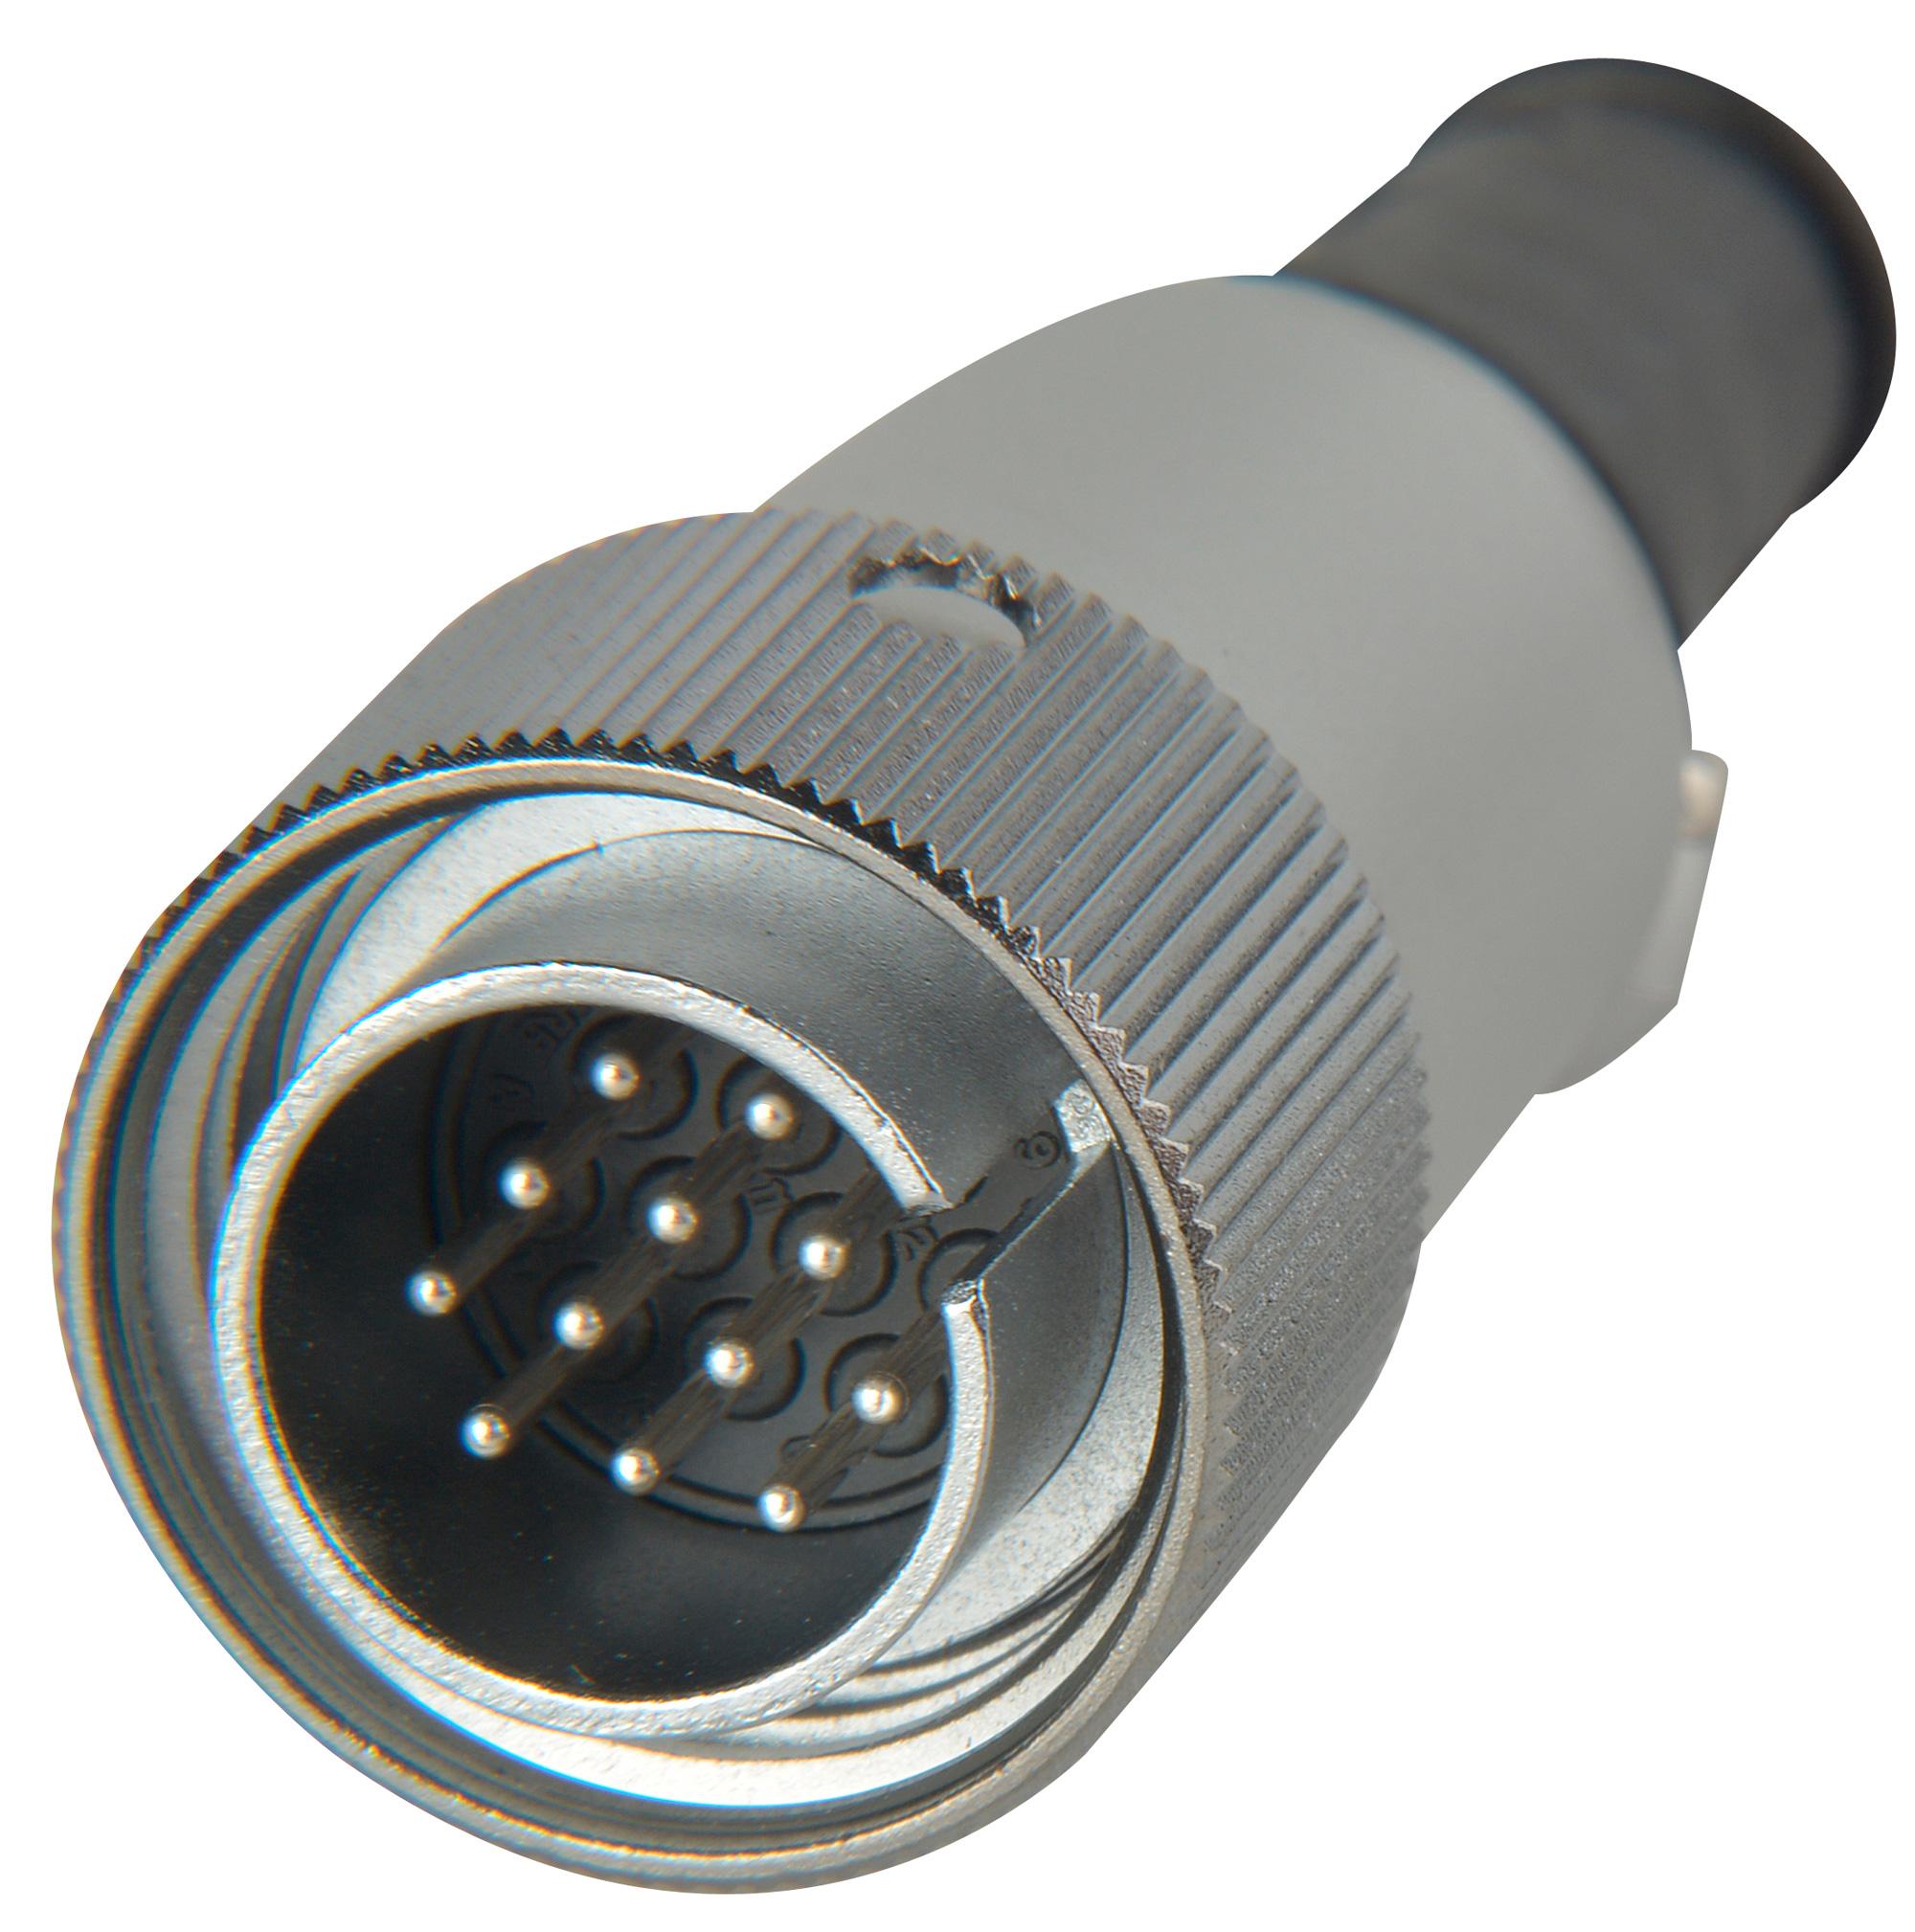 Eiaj 12 Pin Male Circular Connector